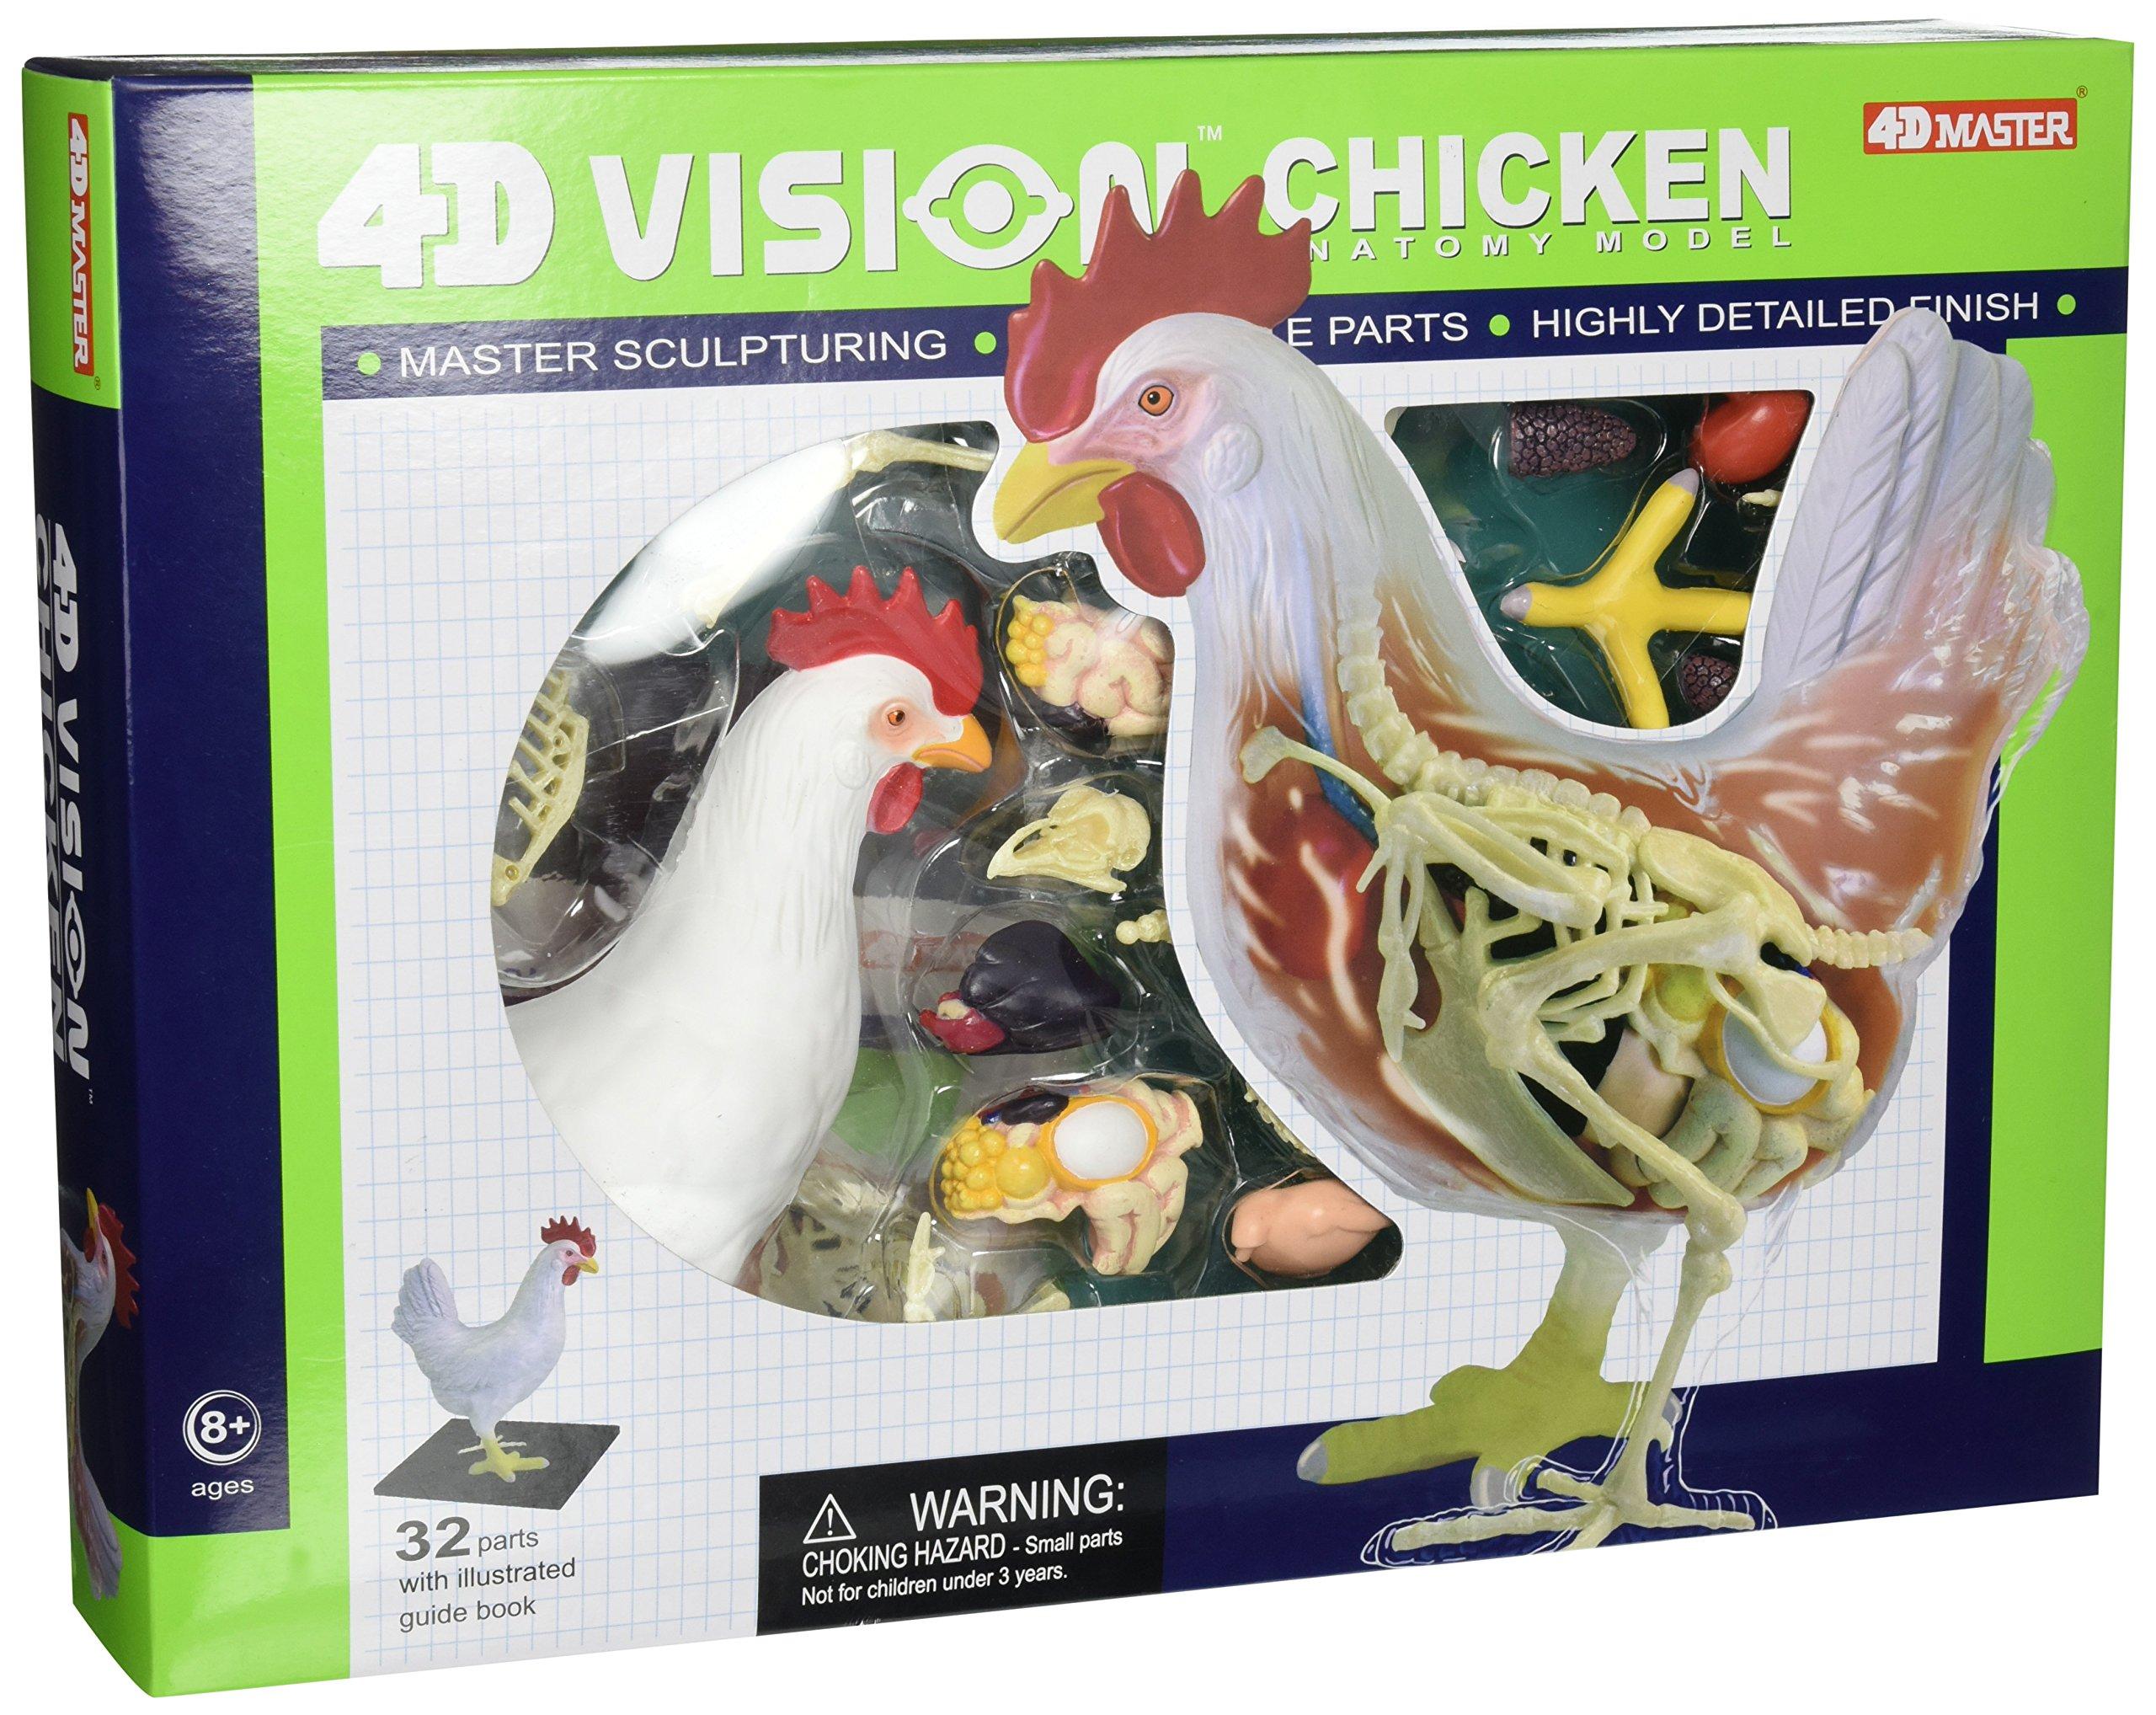 Tedco 4D Vision Chicken Anatomy Model